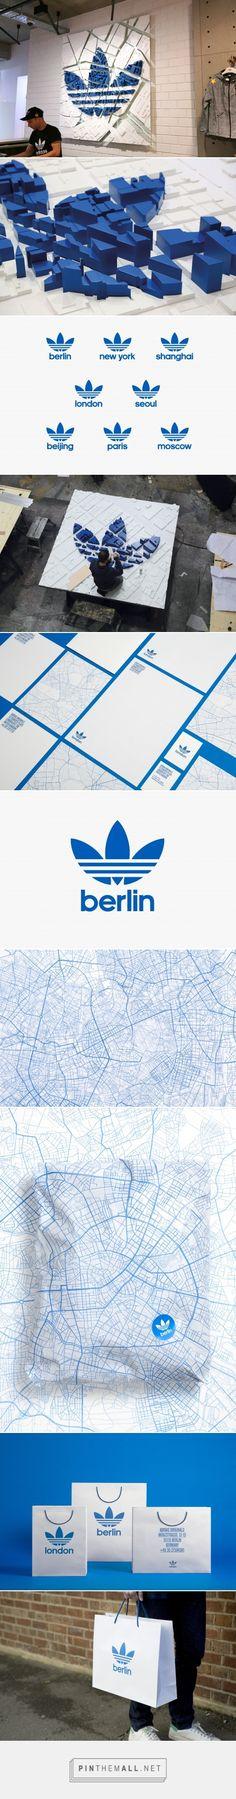 Adidas Originals Branding by Here Design | Fivestar Branding – Design and Branding Agency & Inspiration Gallery